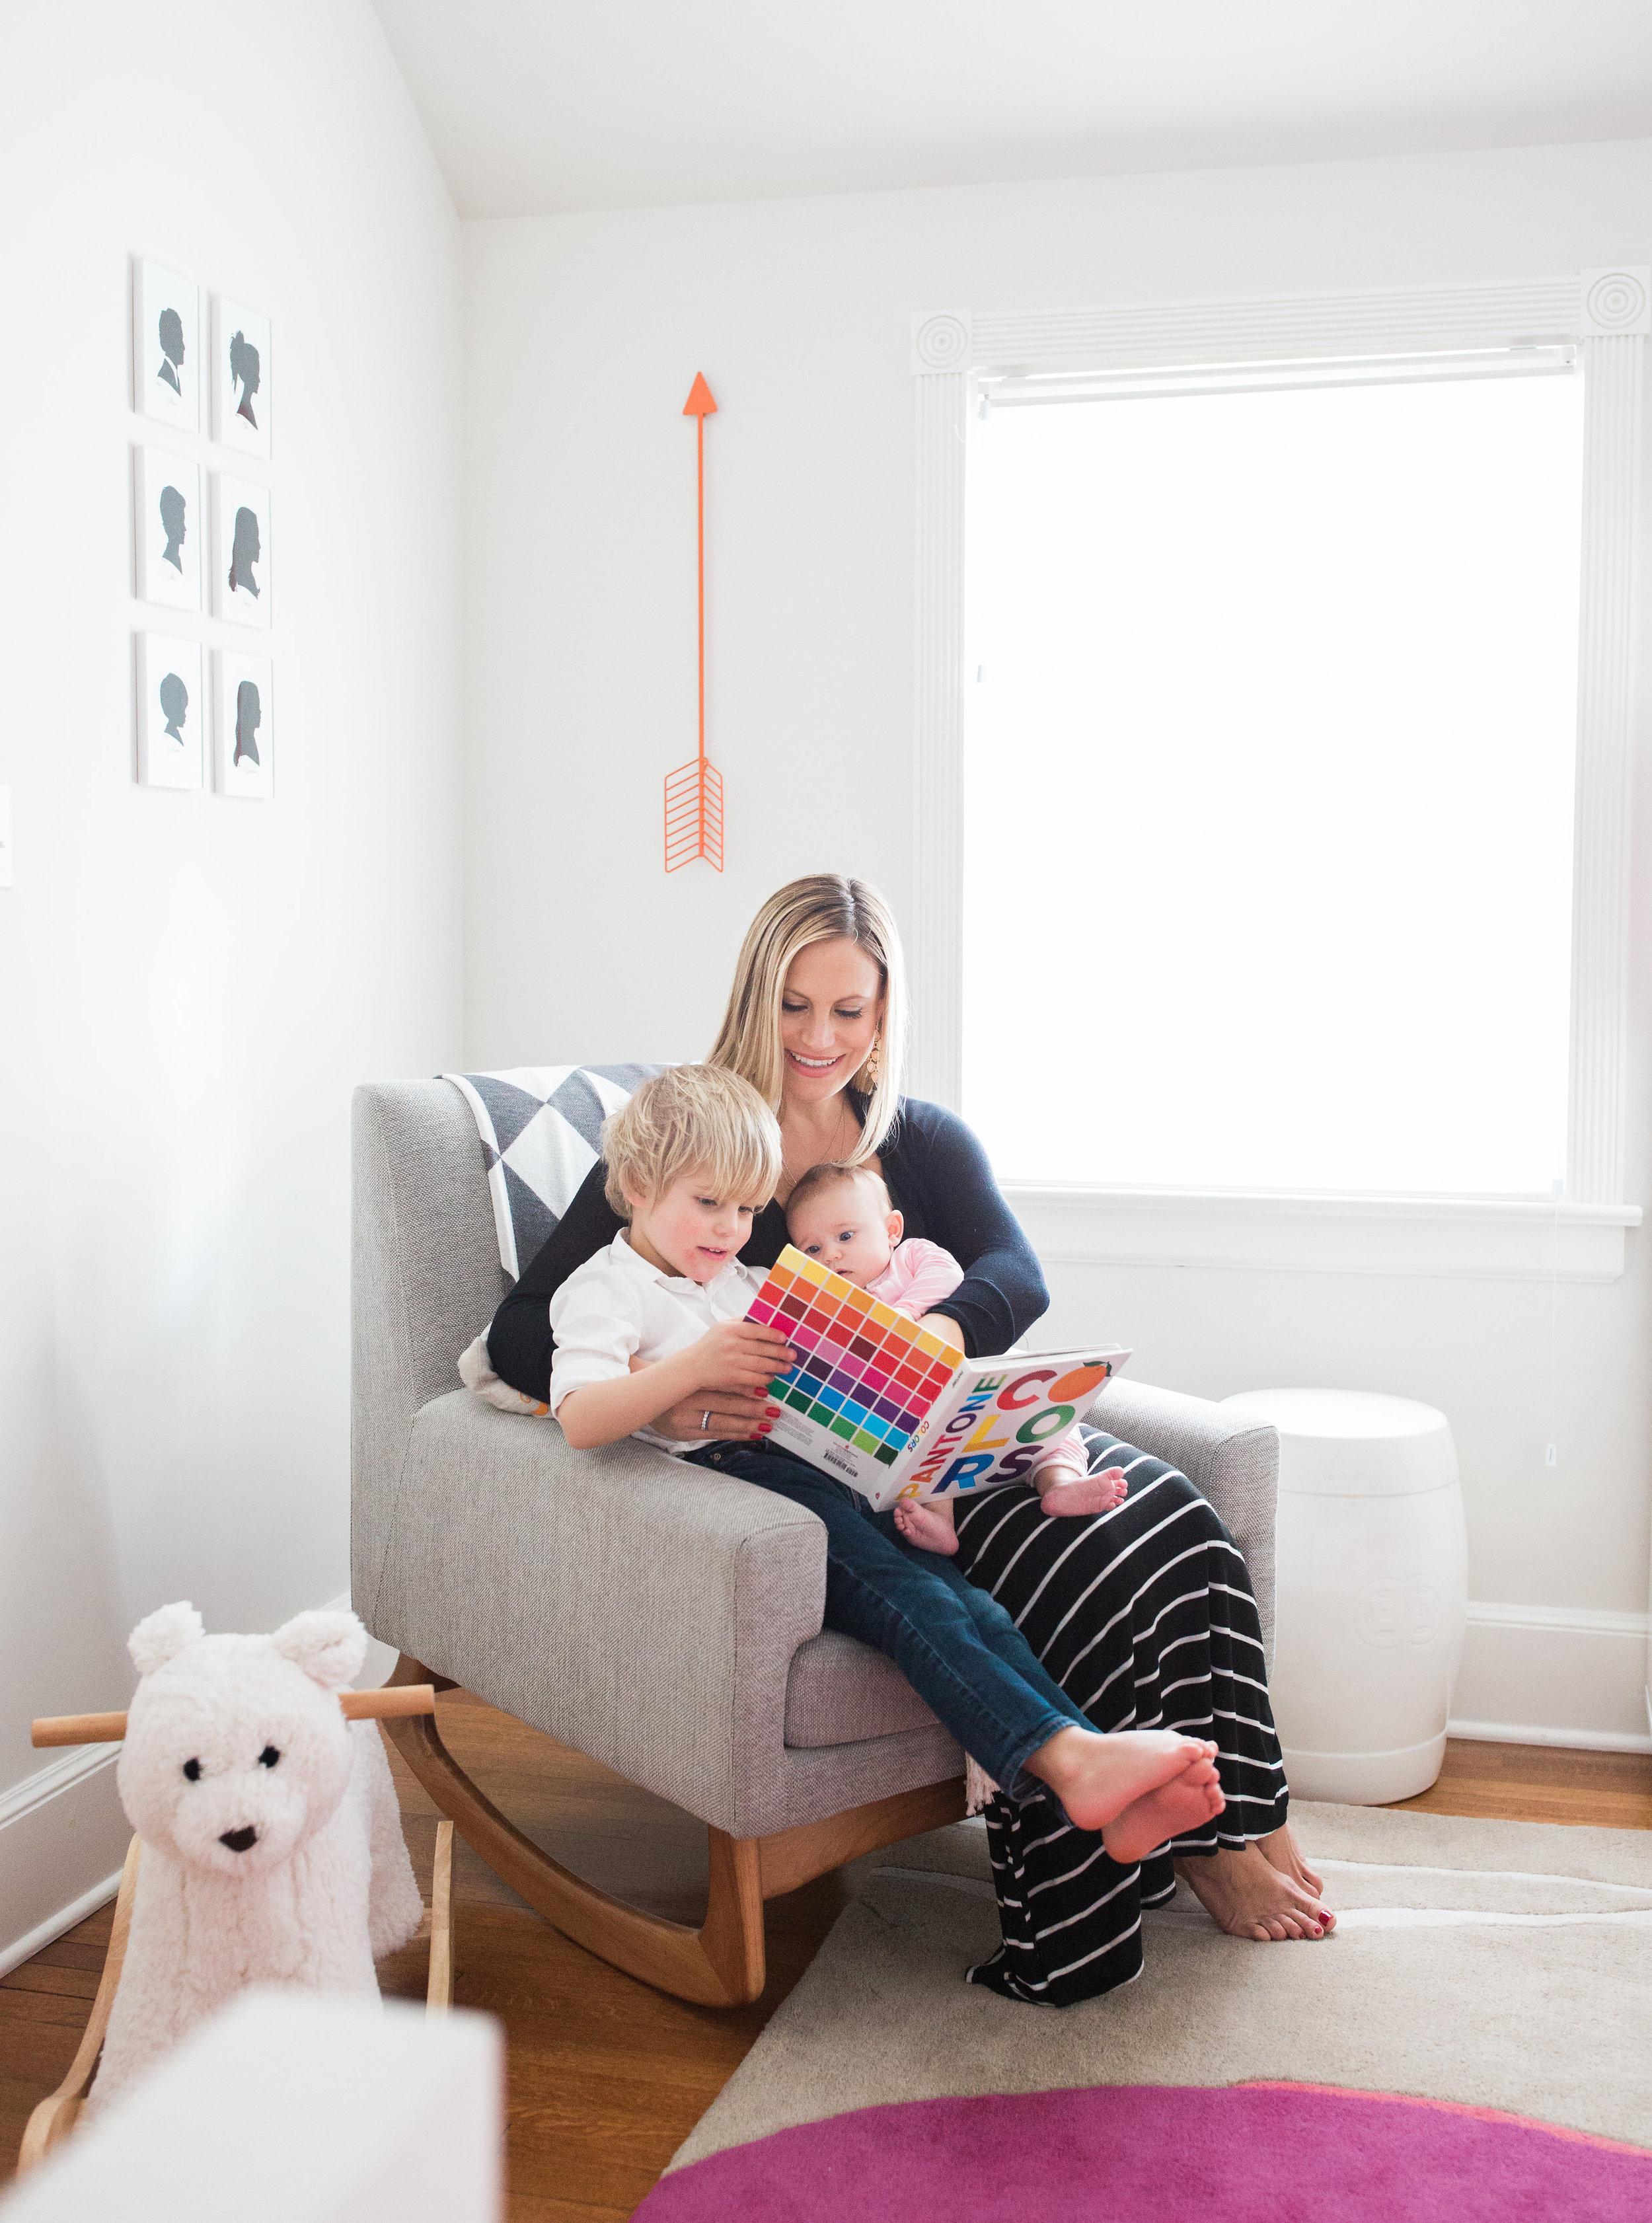 Ceci_Johnson_Newborn_Photo_Schoot_Ana_Schecter_Kids_Baby_Nursery_Design_Mom_Ceci_New_York.jpg